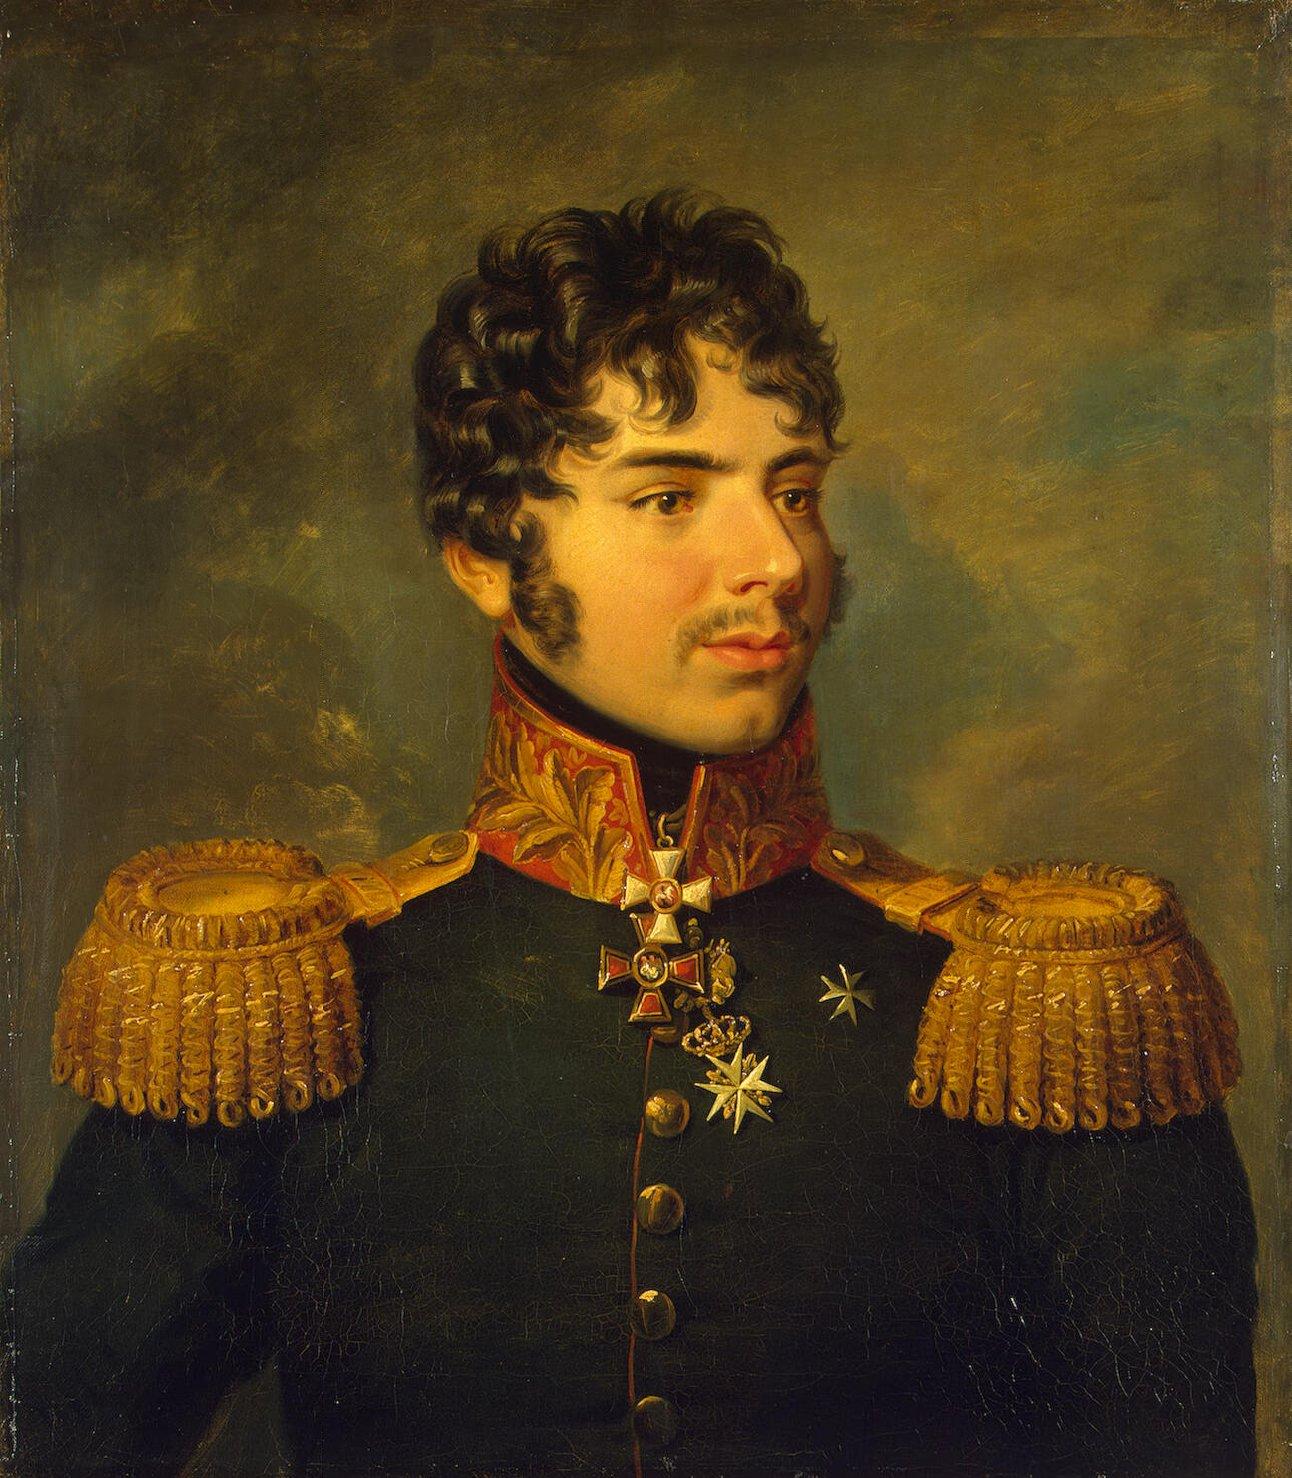 Кутайсов, Александр Иванович